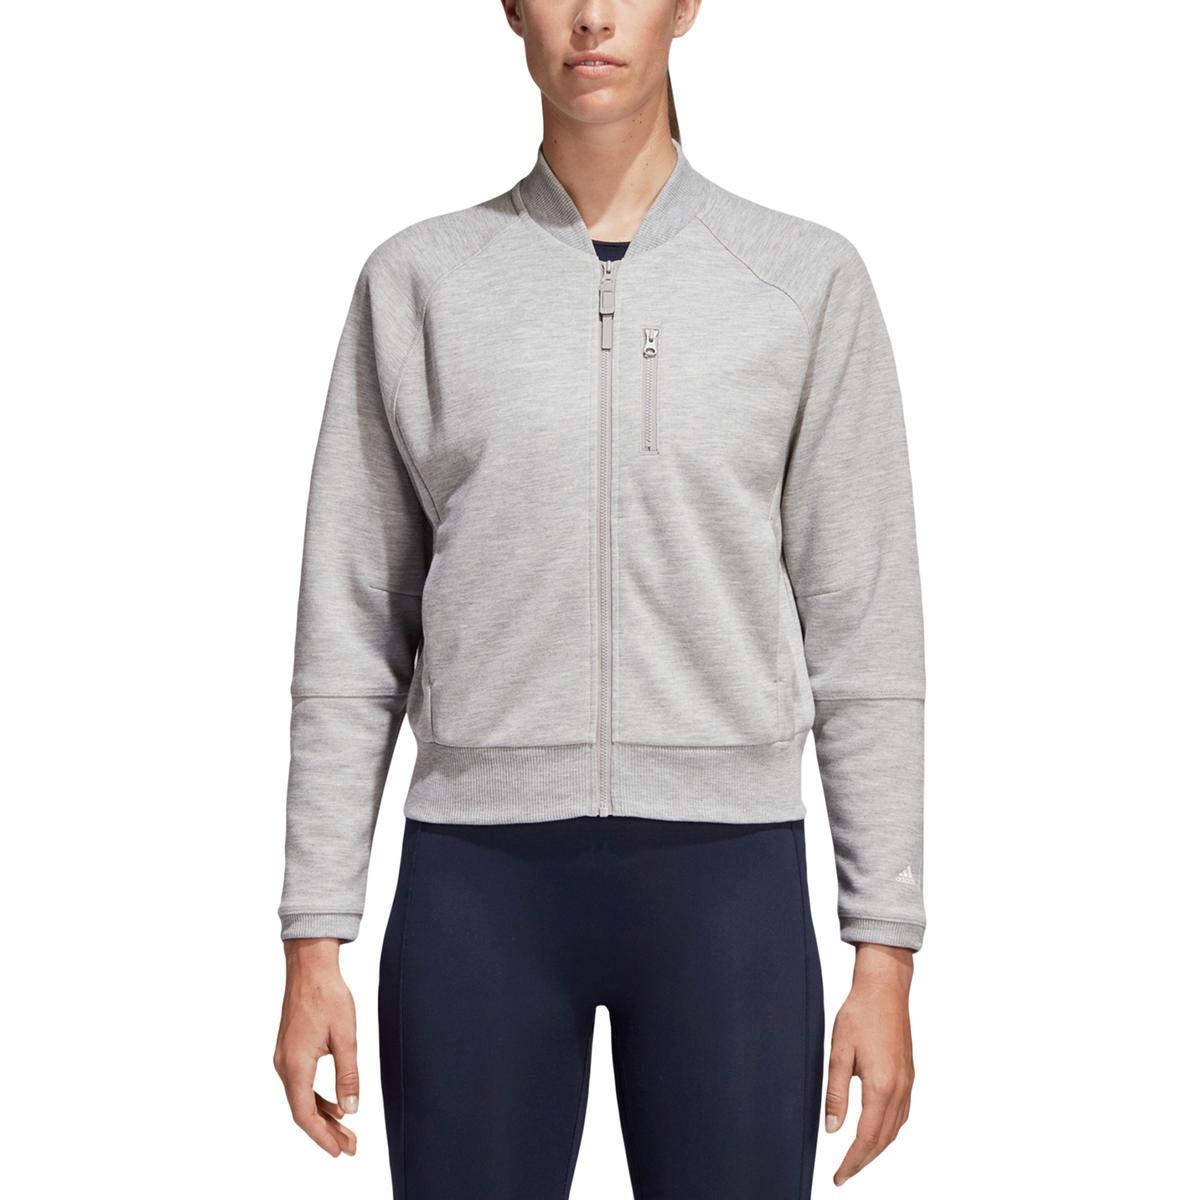 adidas Womens Wanderlust Yoga Fitness Athletic Jacket Gray S ...